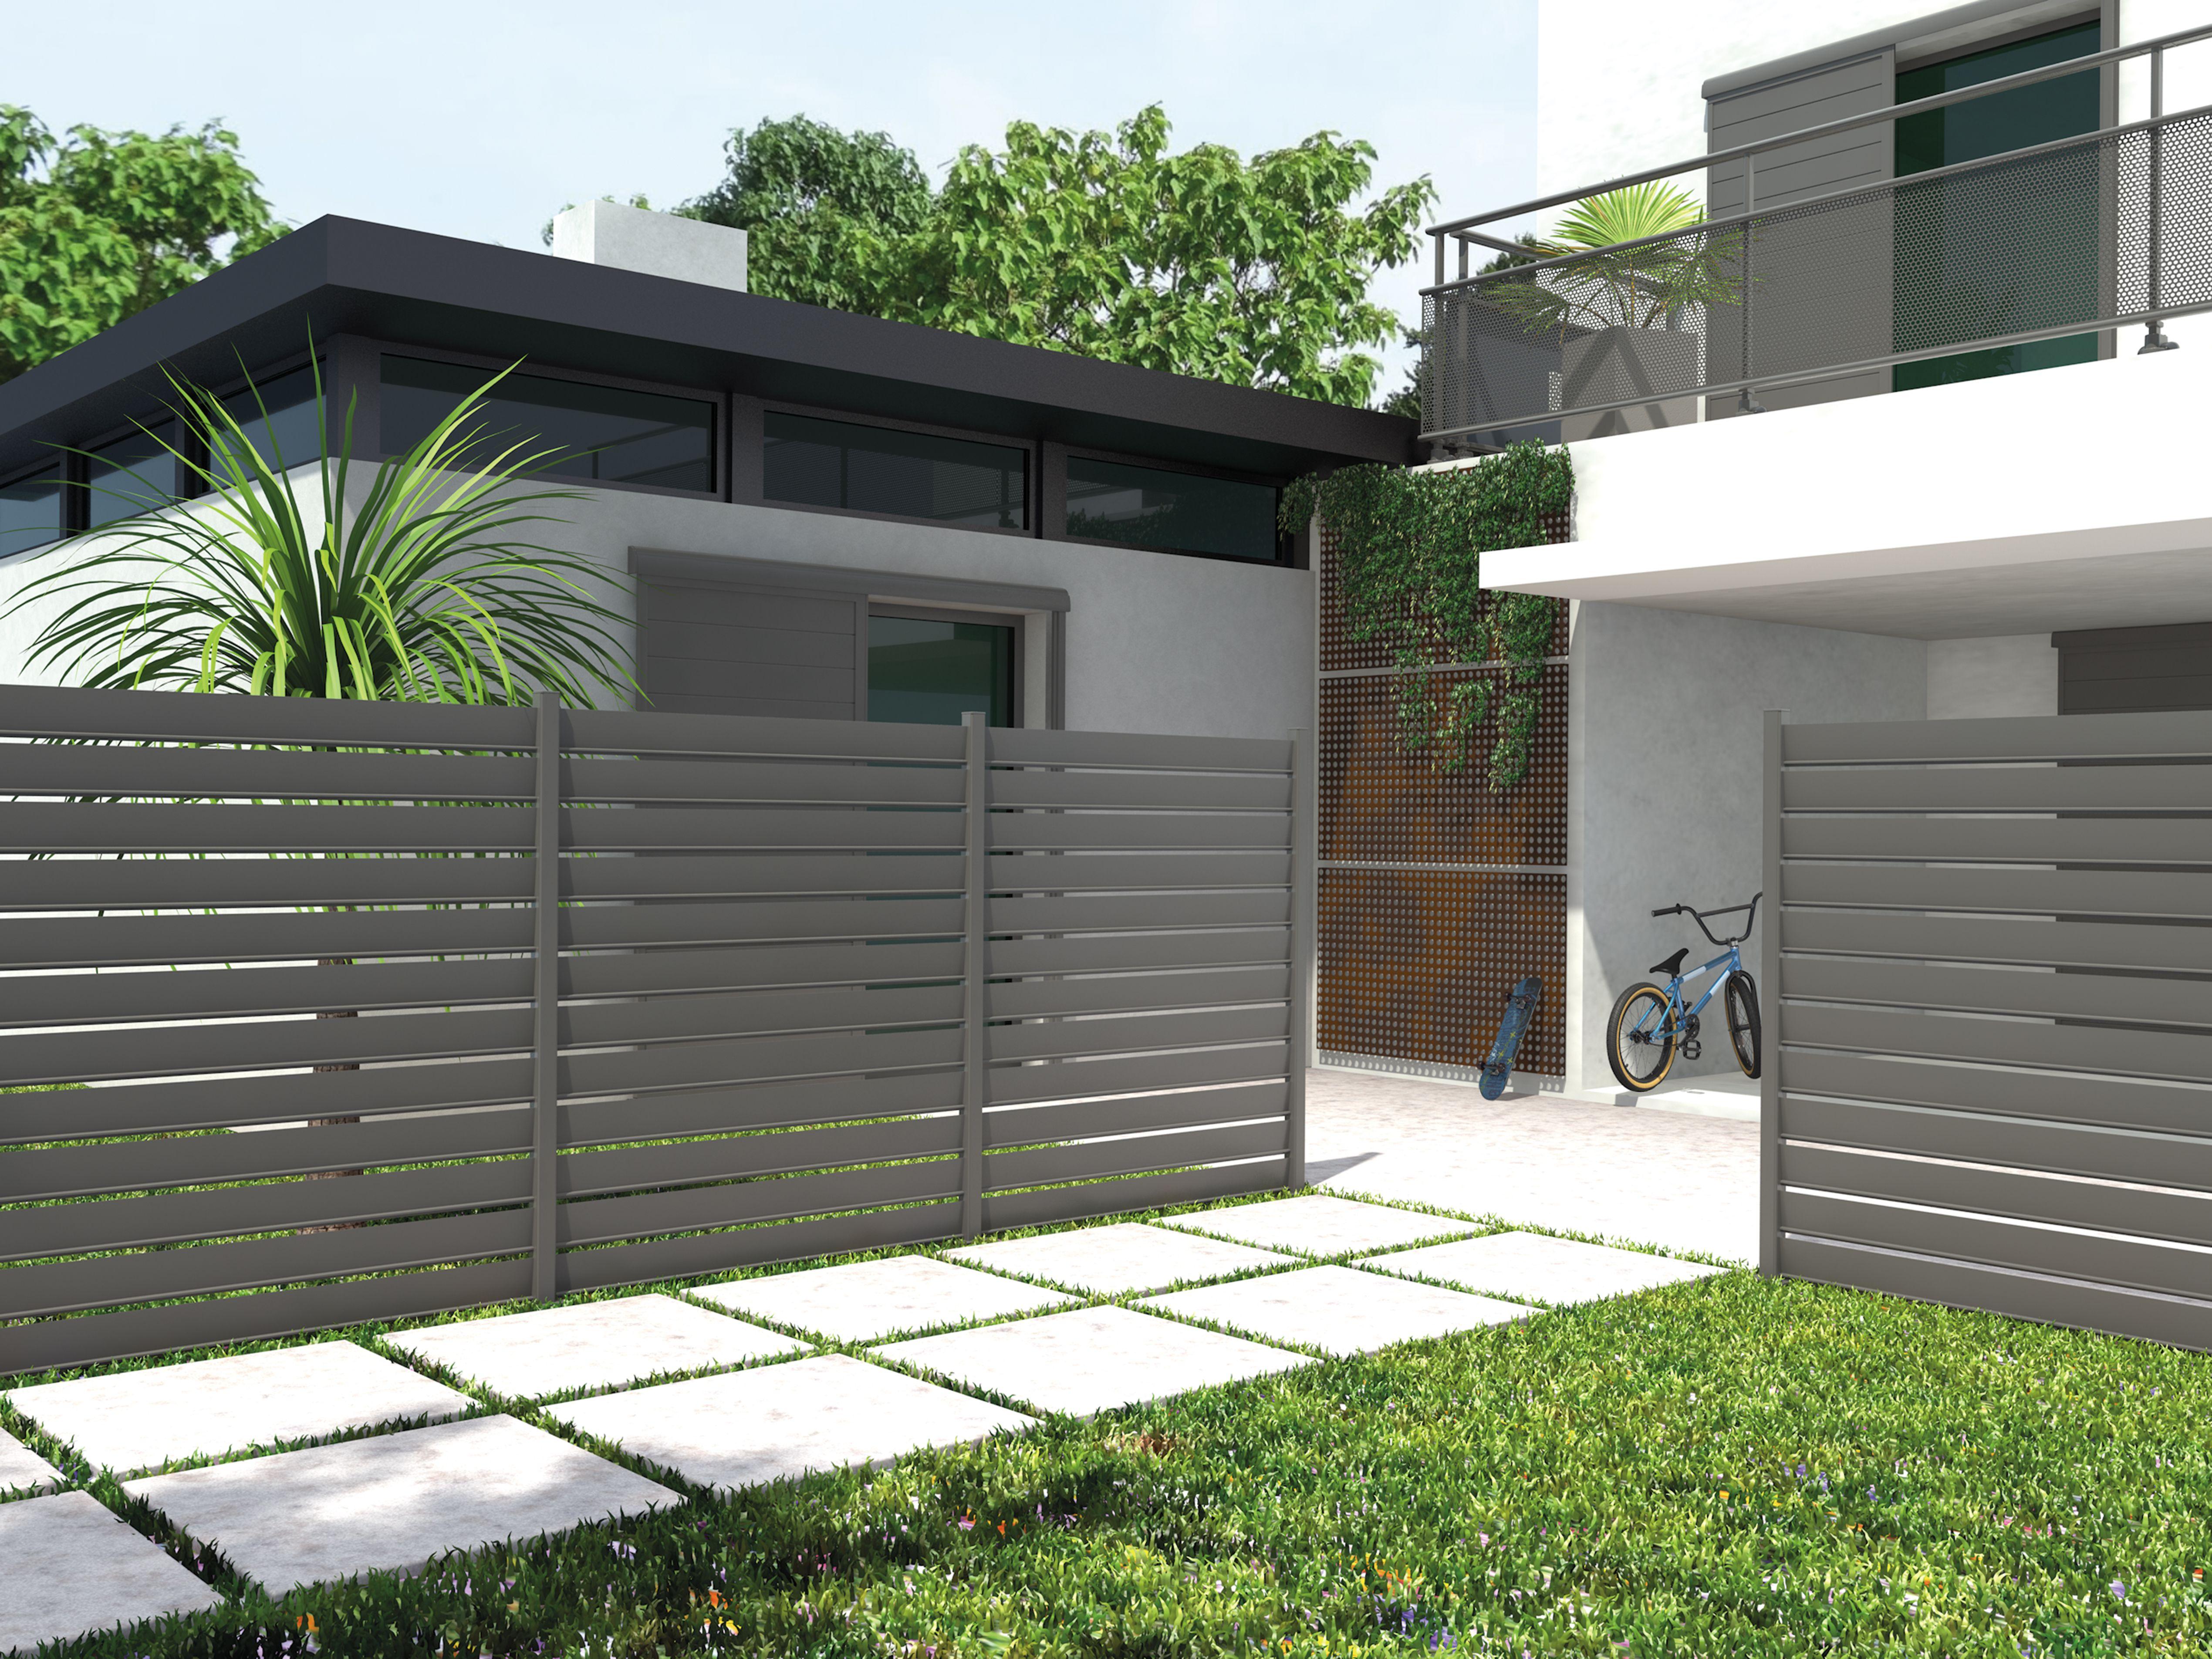 Pingl par portails aluminium sib sur claustra aluminium - Claustra coulissant ...